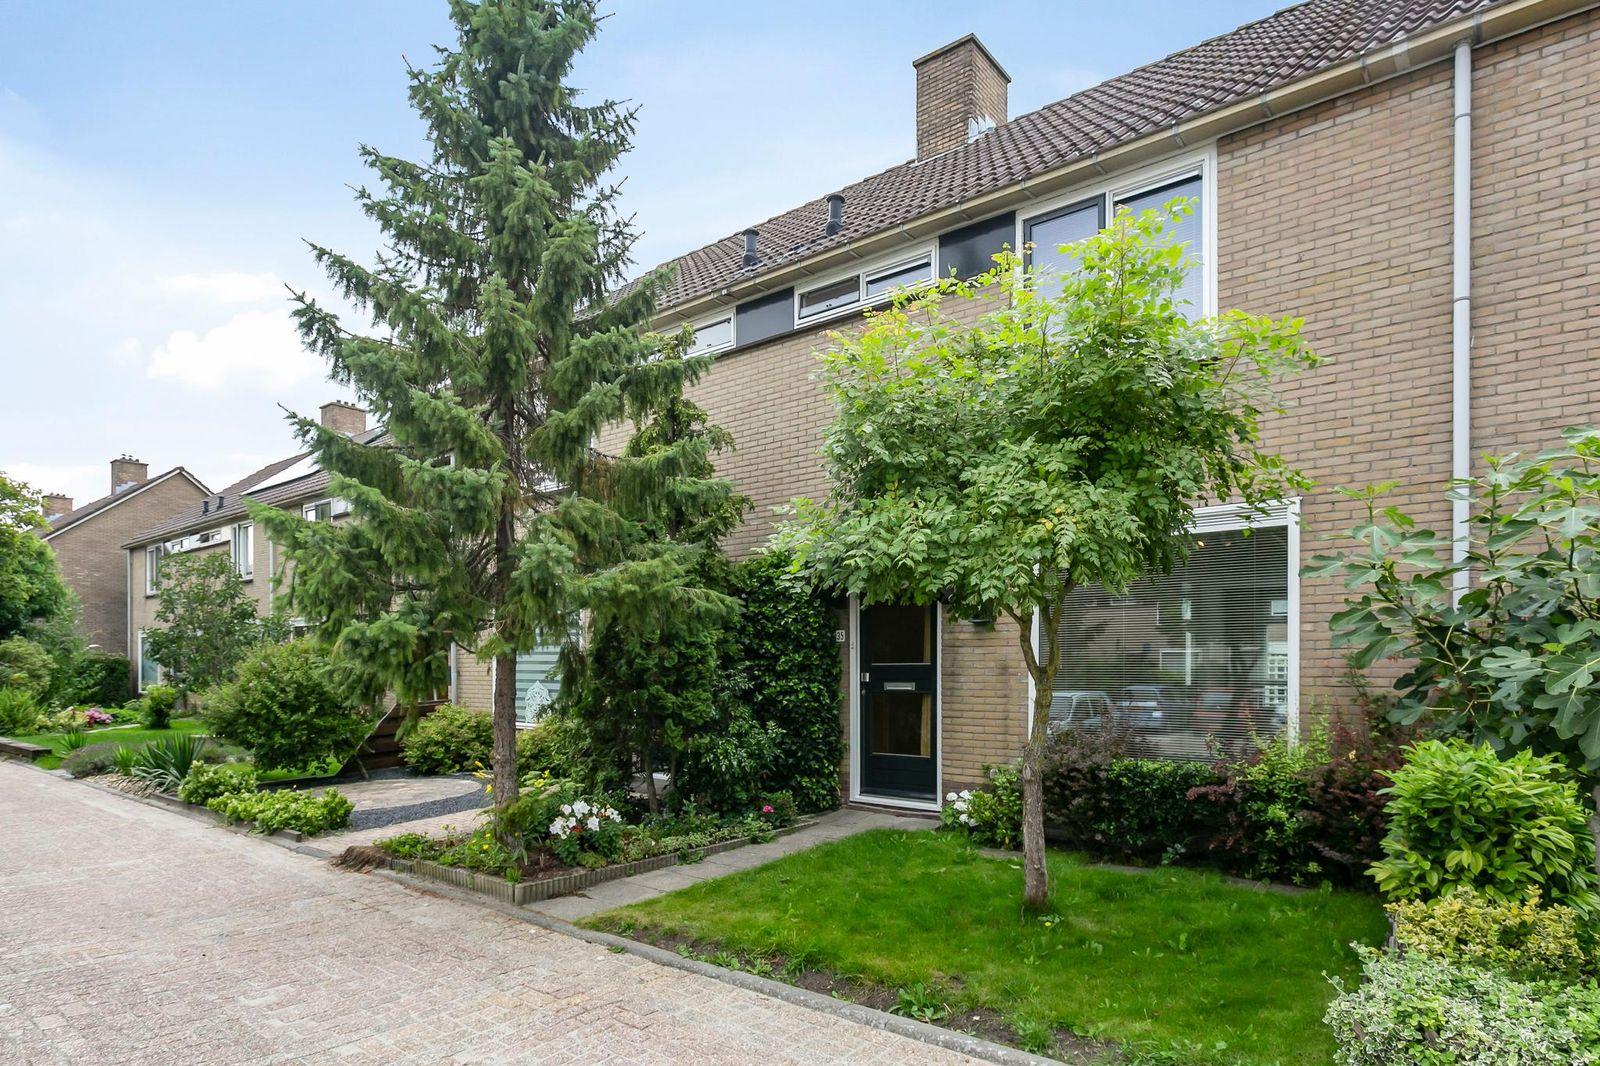 Breedmede 35, Middelburg